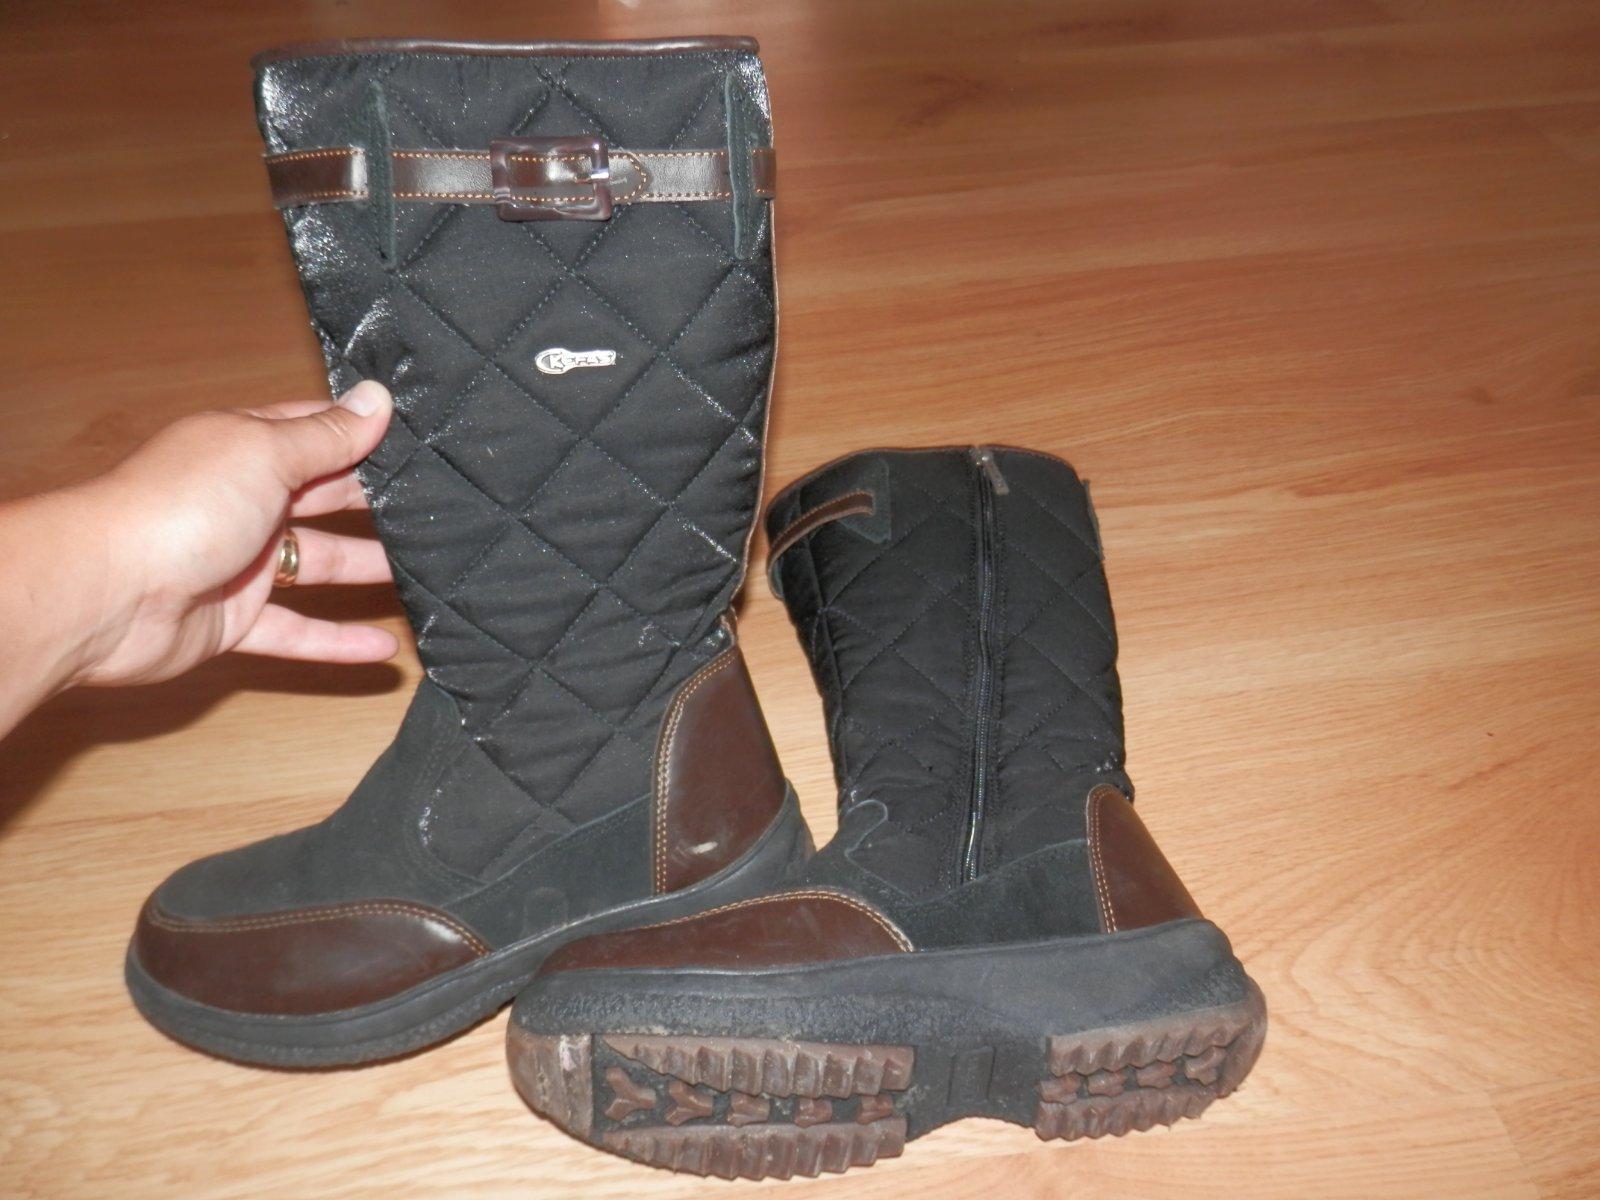 4c27ebd18a Čierne čižmy na zimu zn. kefas